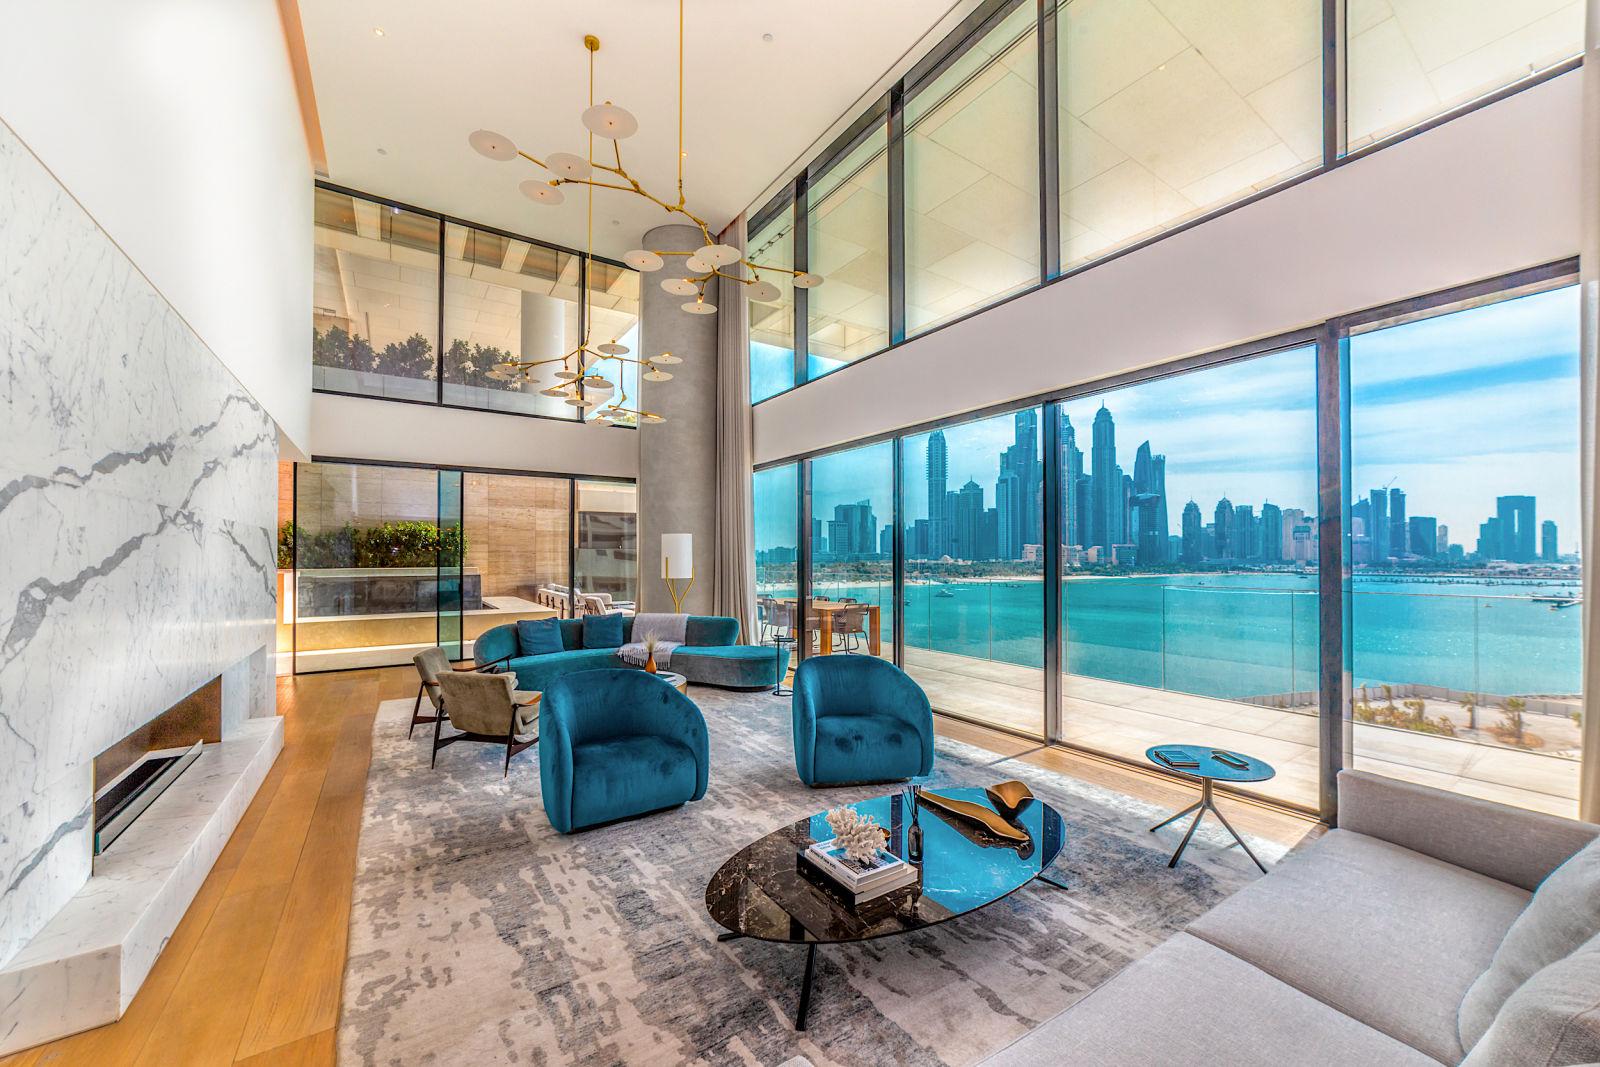 Buy luxury Property in Dubai